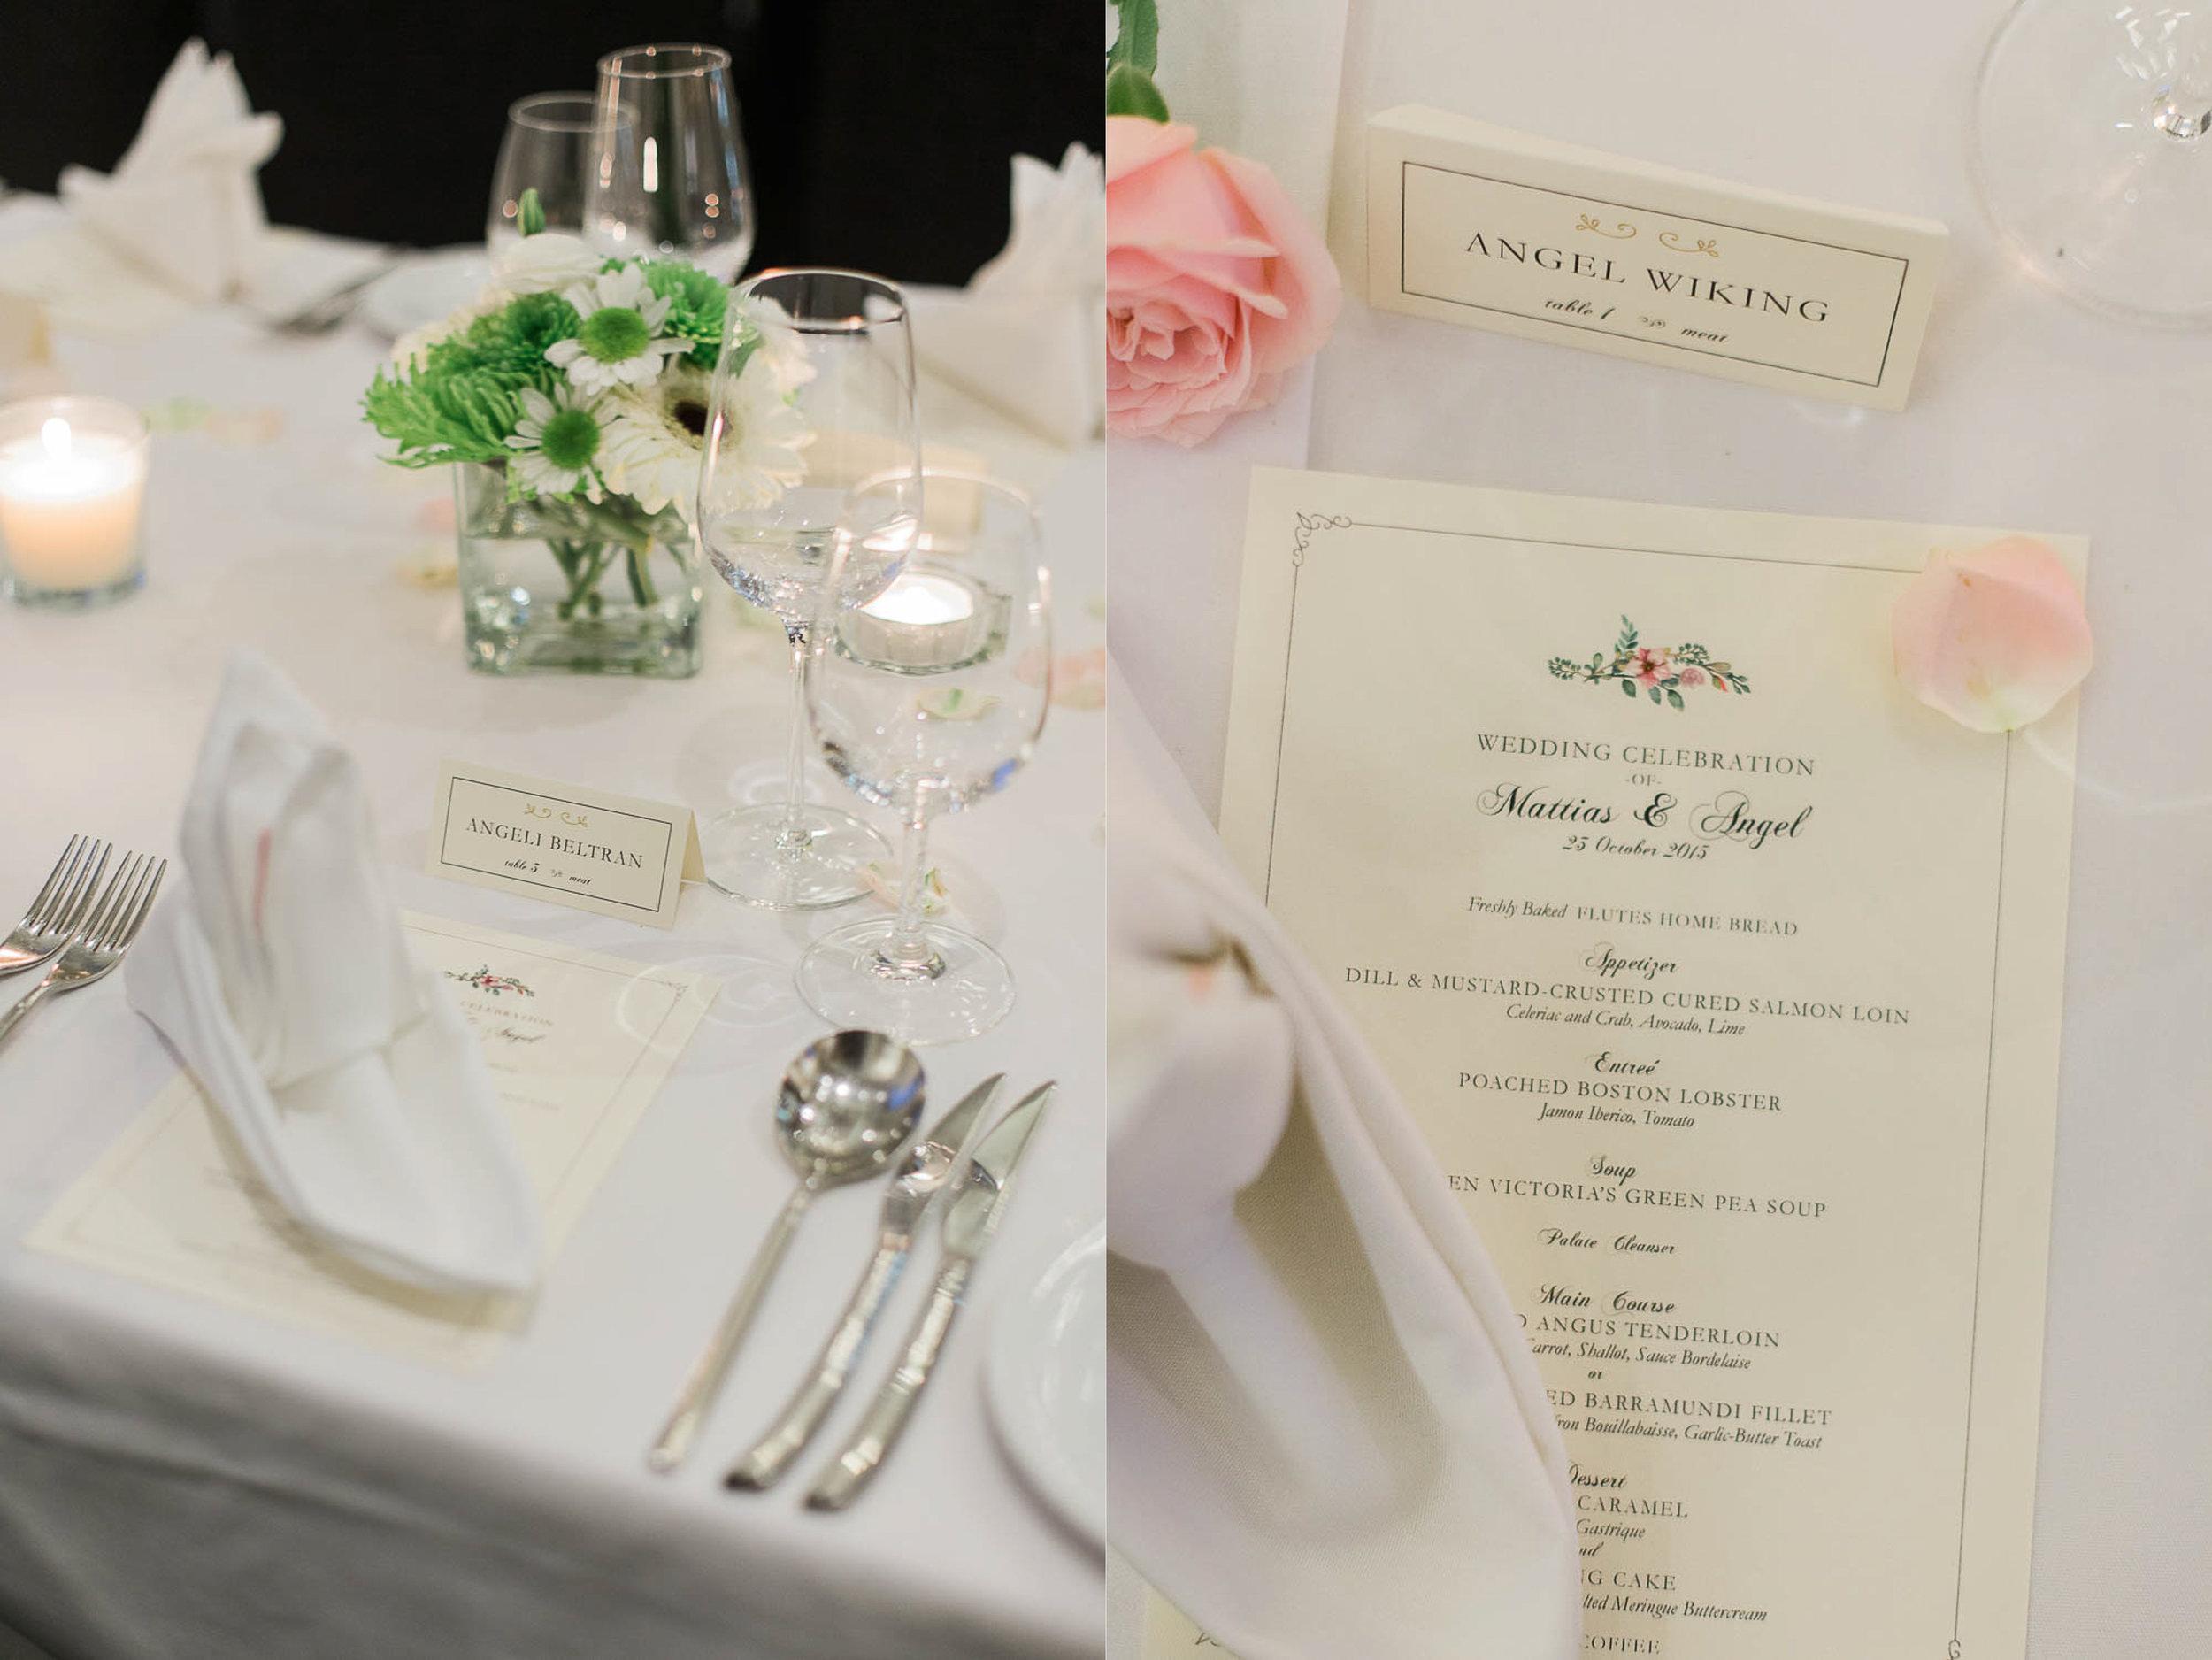 wedding-photographer-singapore-film-photographer-chen-sands-Anglea-wedding-3.jpg